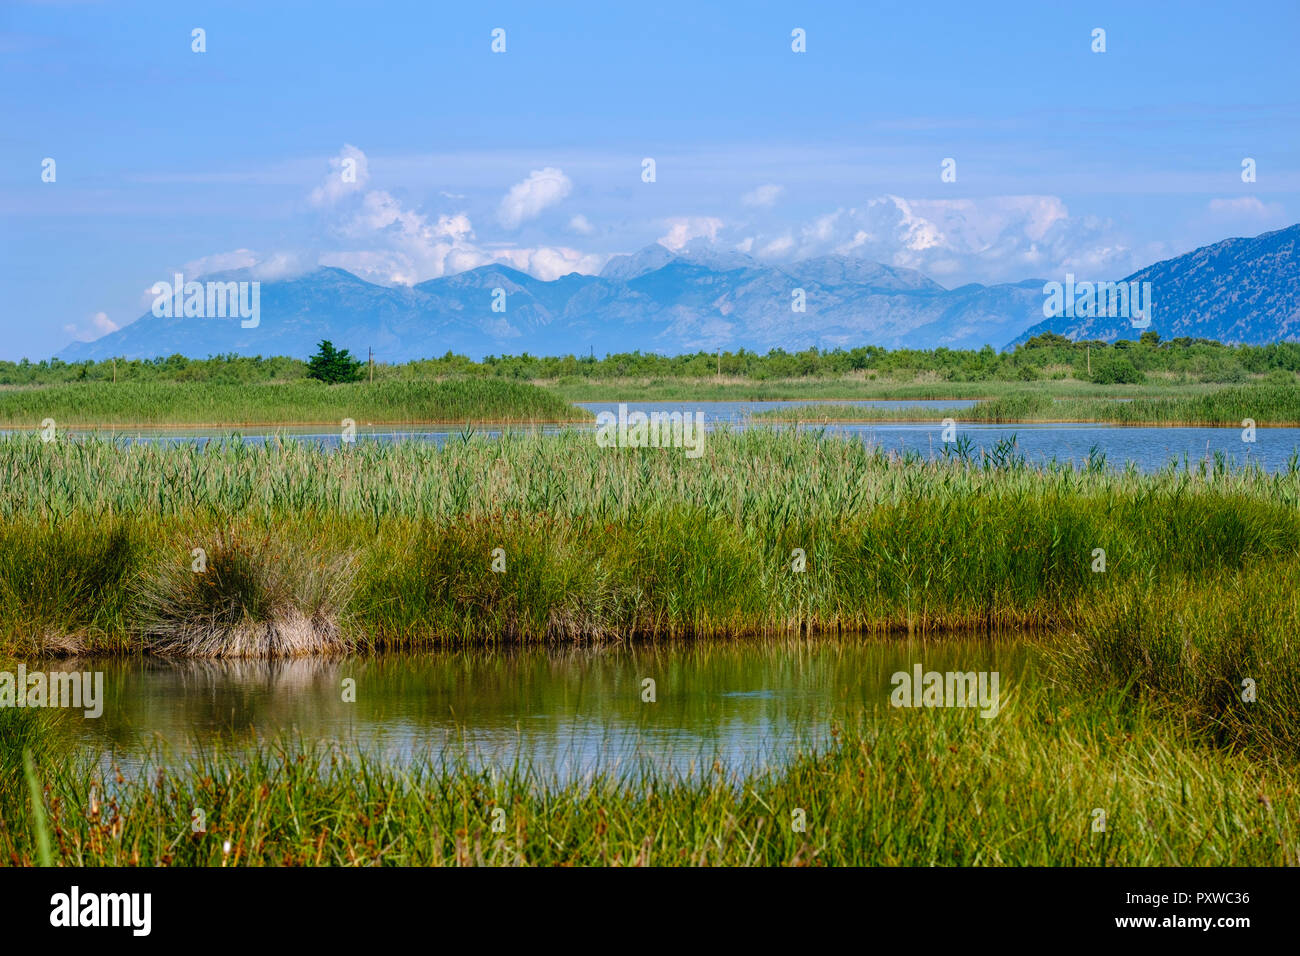 Albania, Lezhe, Lagune, Kune-Vain-Tale Nature Park - Stock Image